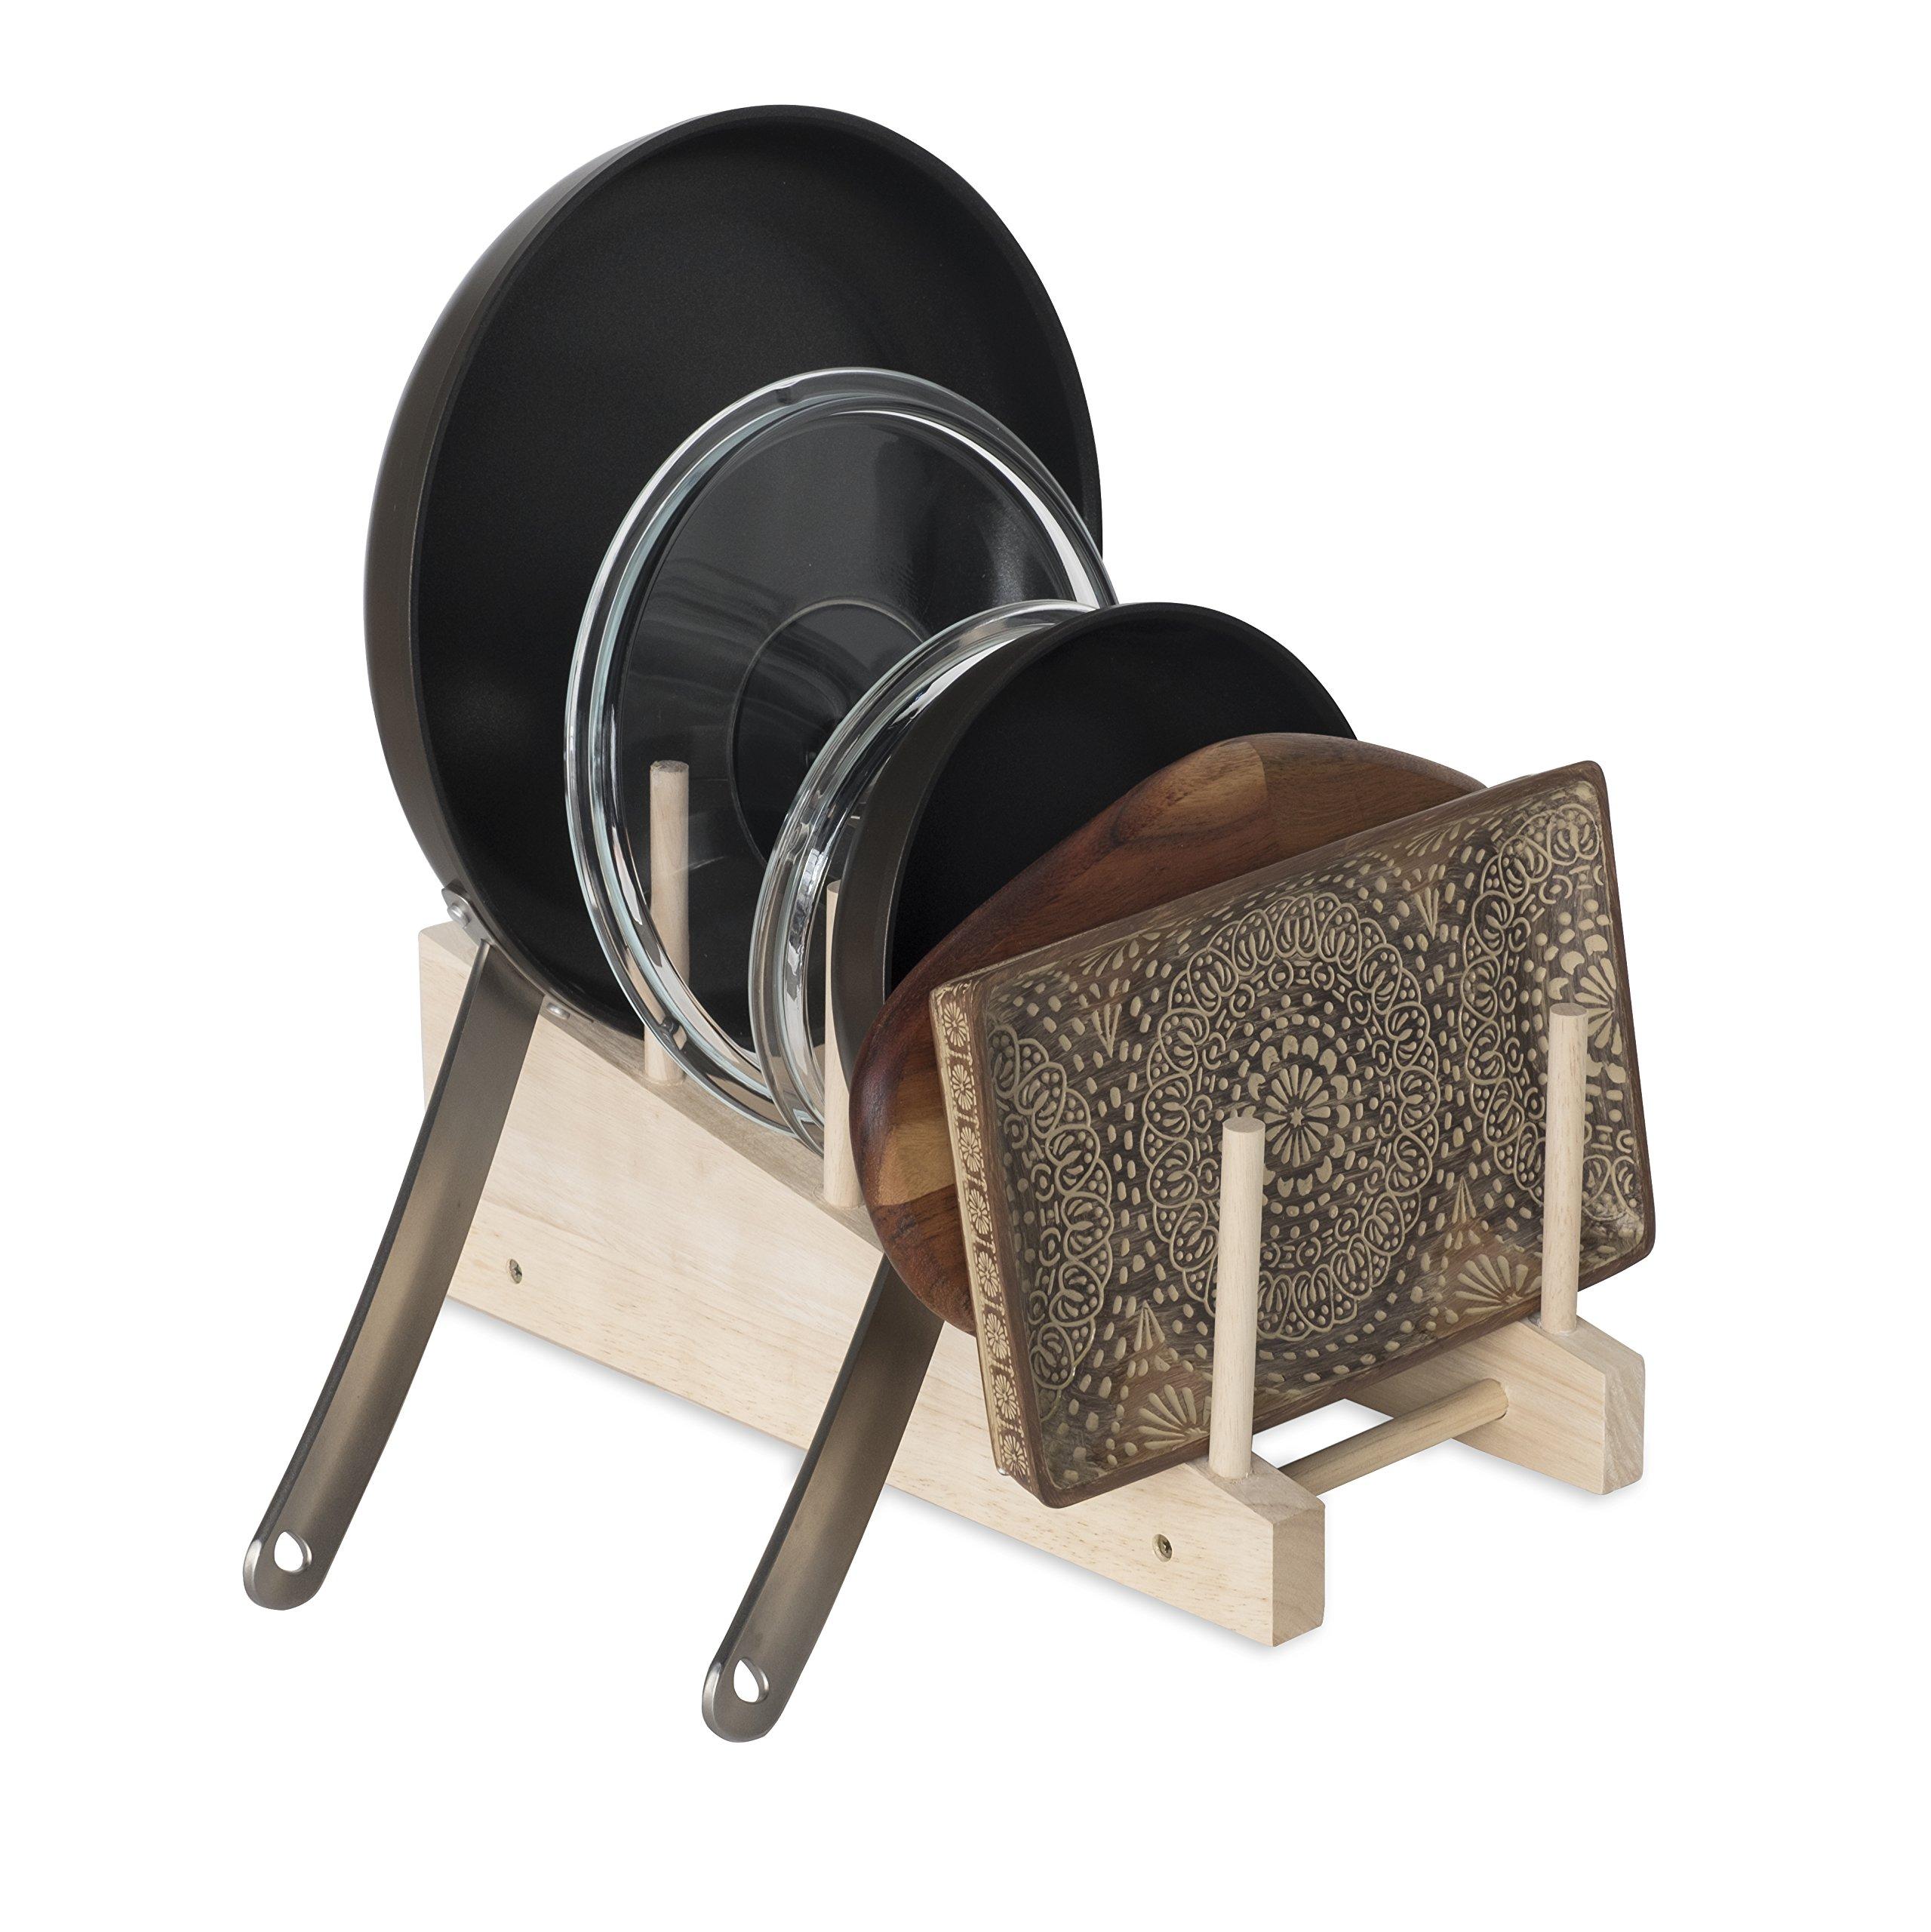 Brightmaison Free-Standing Wooden Cookware Cutting Board 4-Slot Kitchen Storage Countertop Pan Pot Lid Organizer Rack Black (Natural)